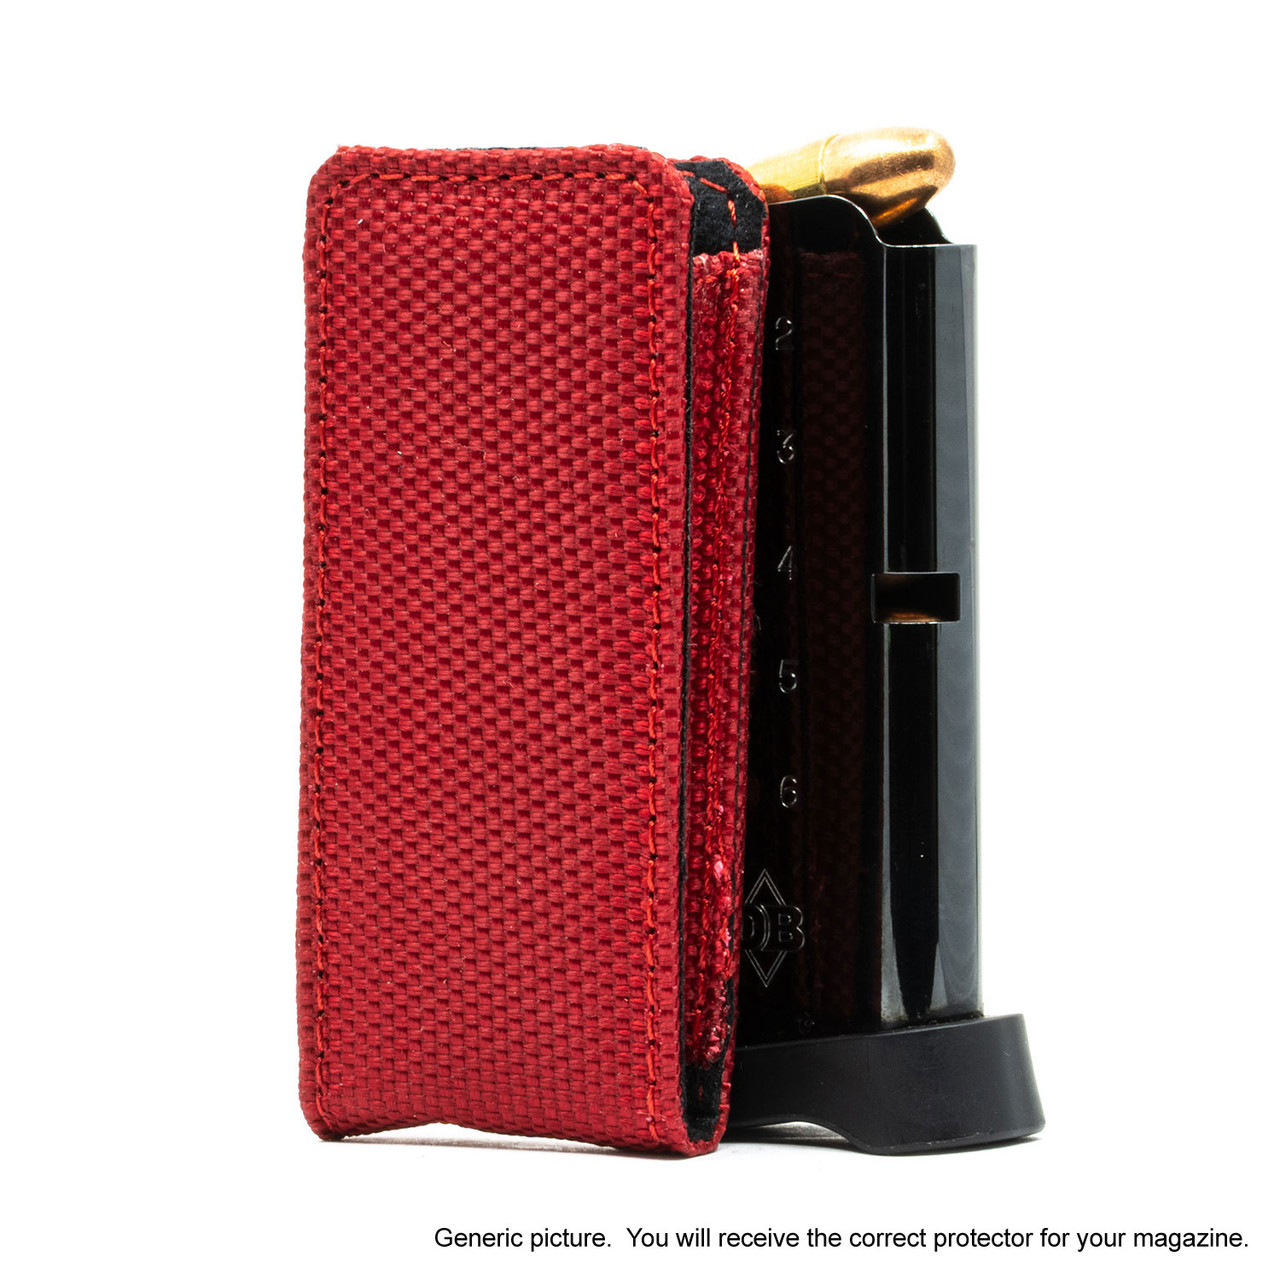 Remington R51 Red Covert Magazine Pocket Protector